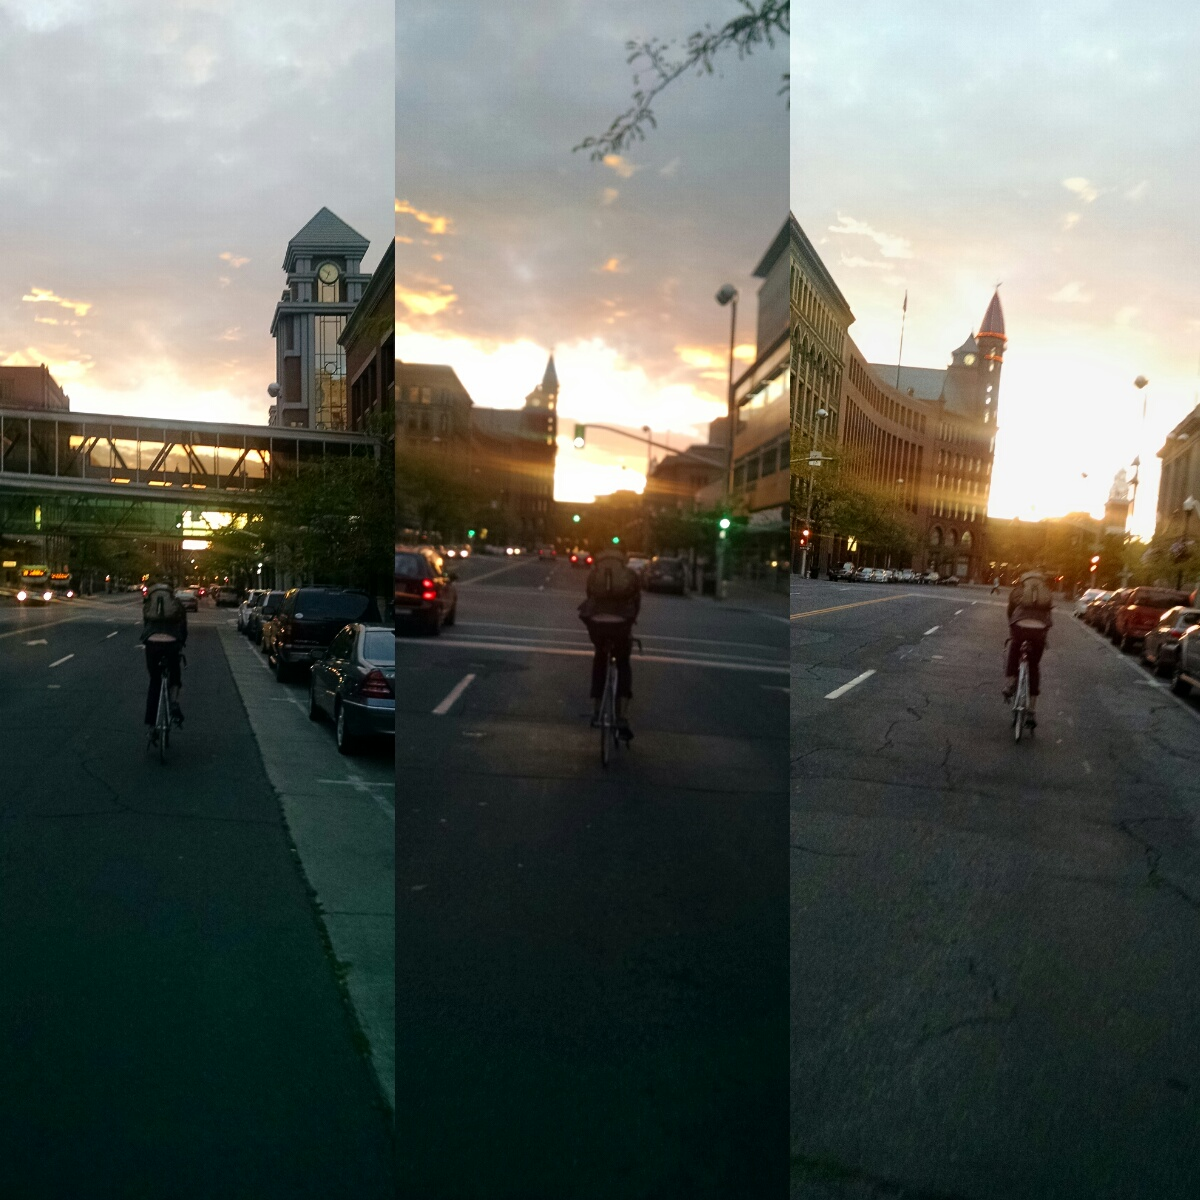 temp_squared_picture-1.jpg